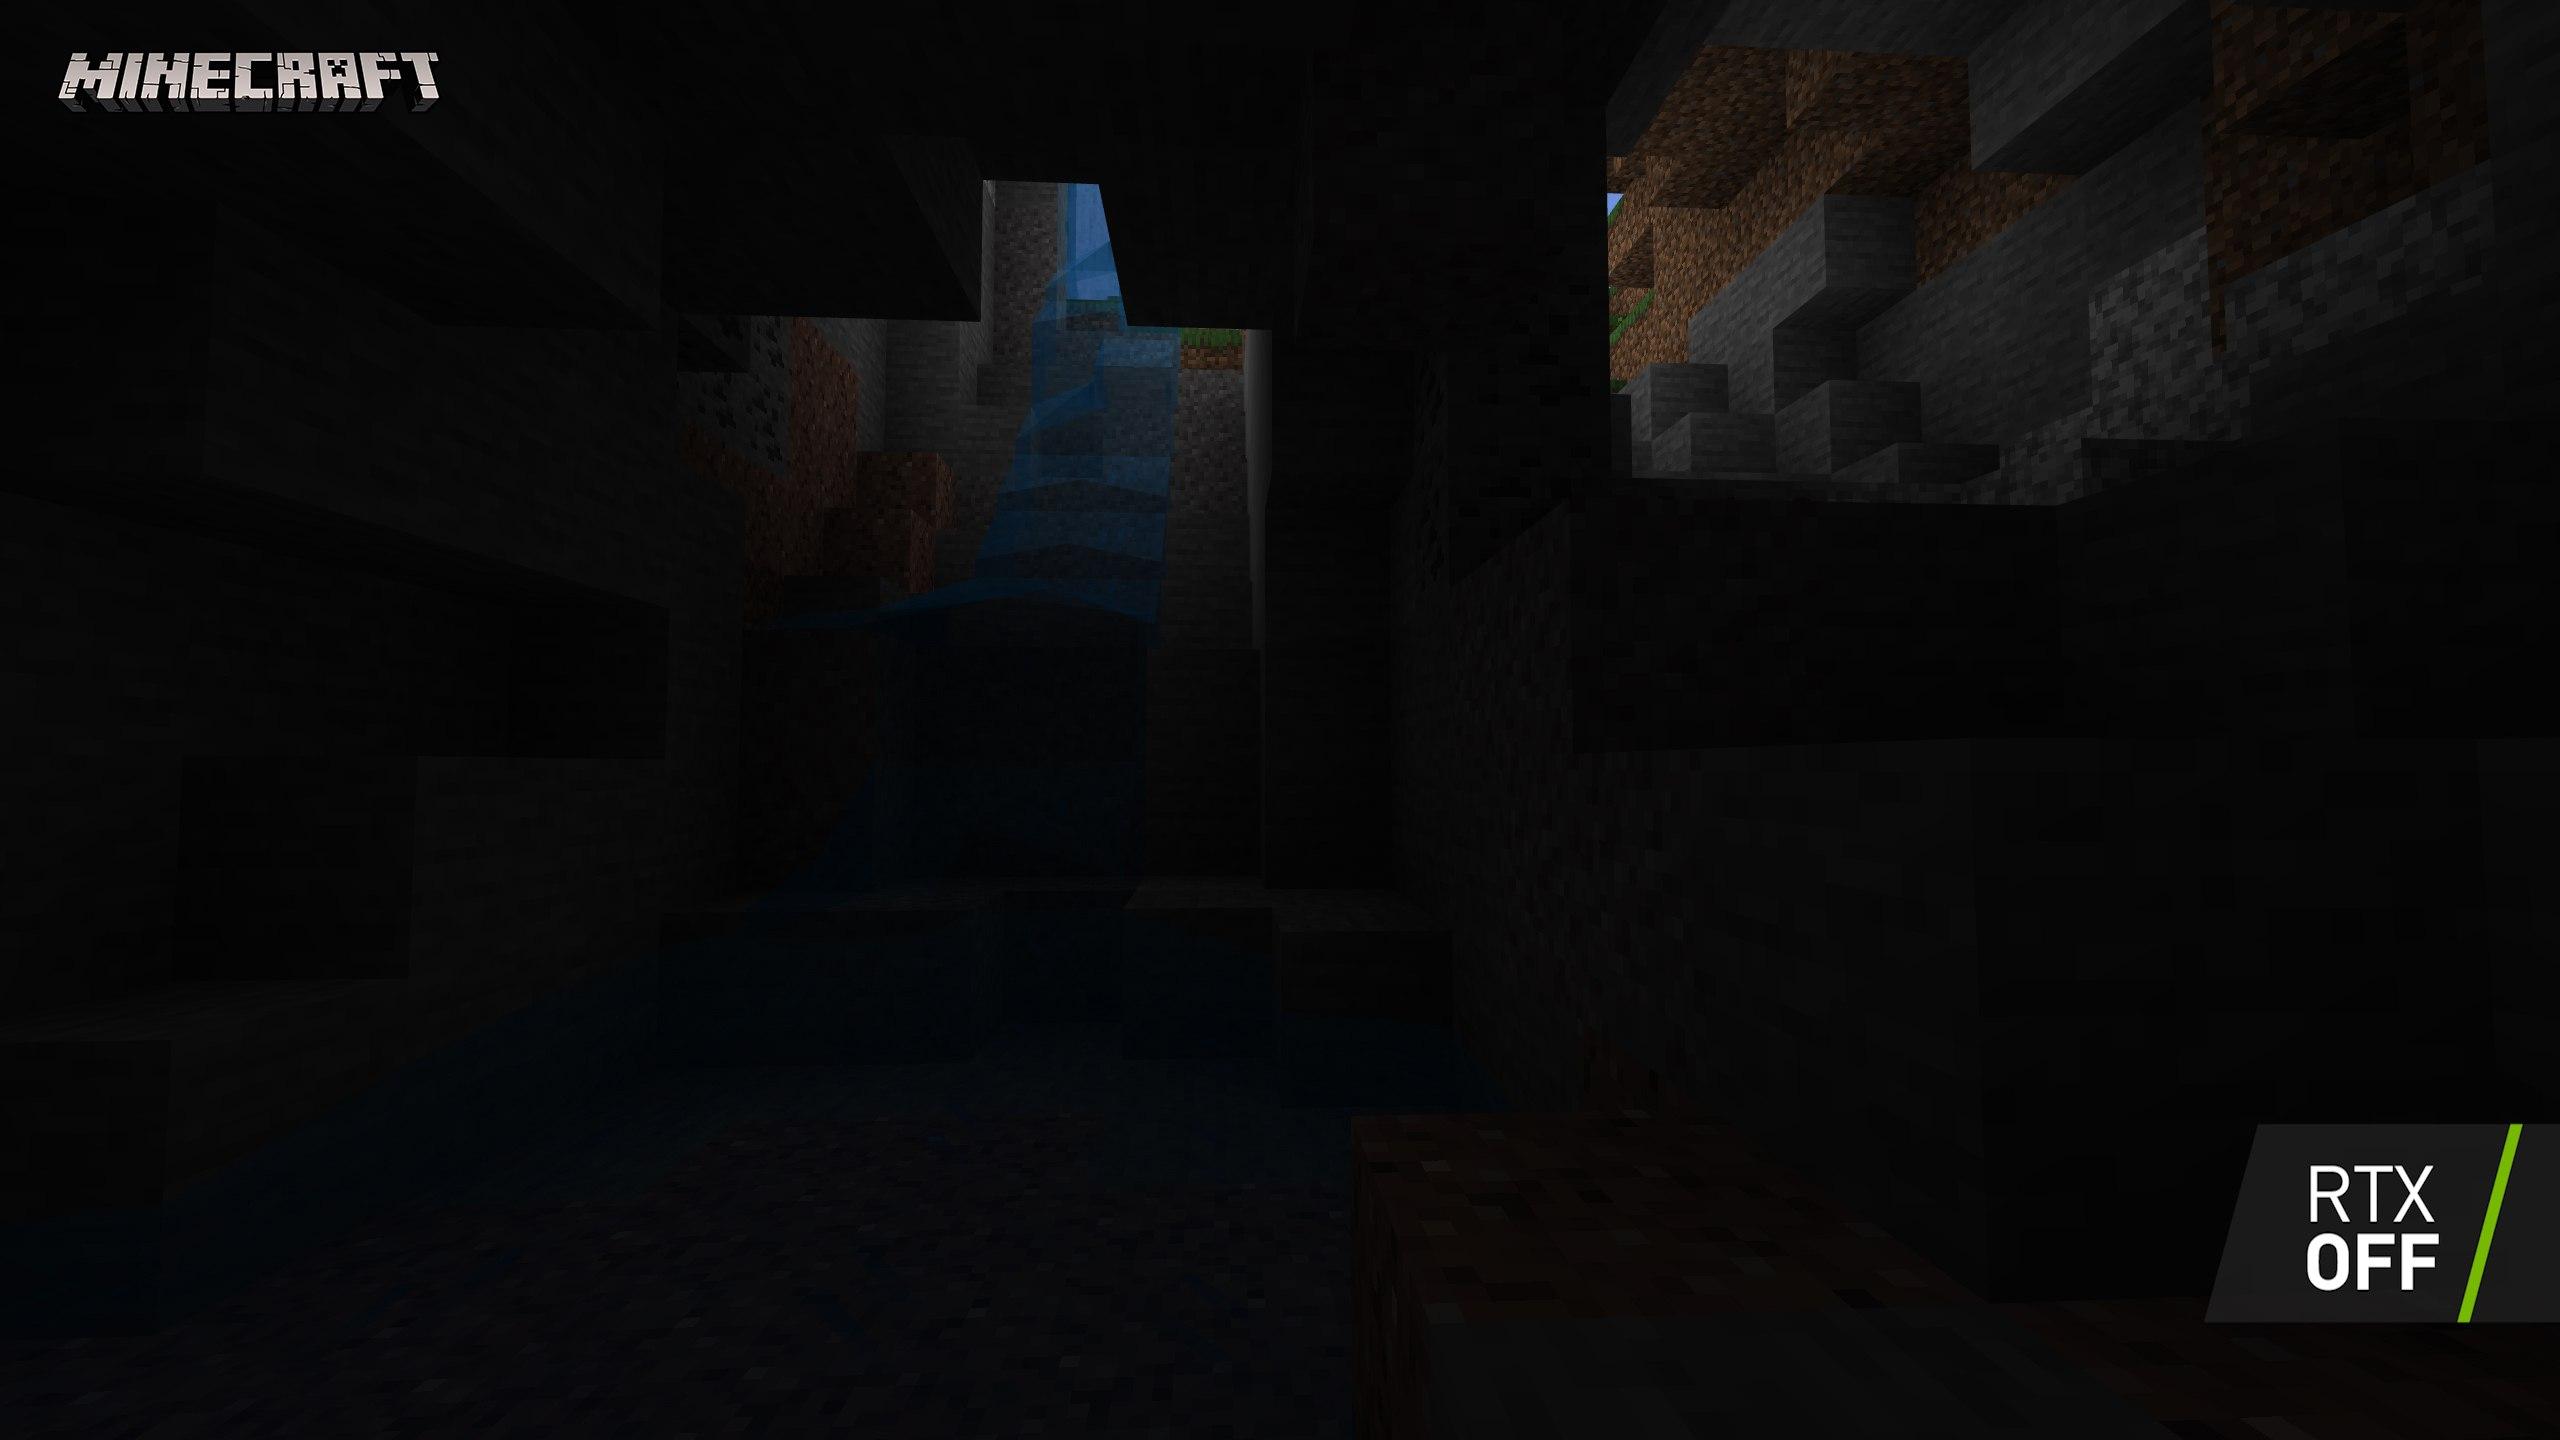 minecraft with rtx beta crystal palace global illumination 001 rtx off